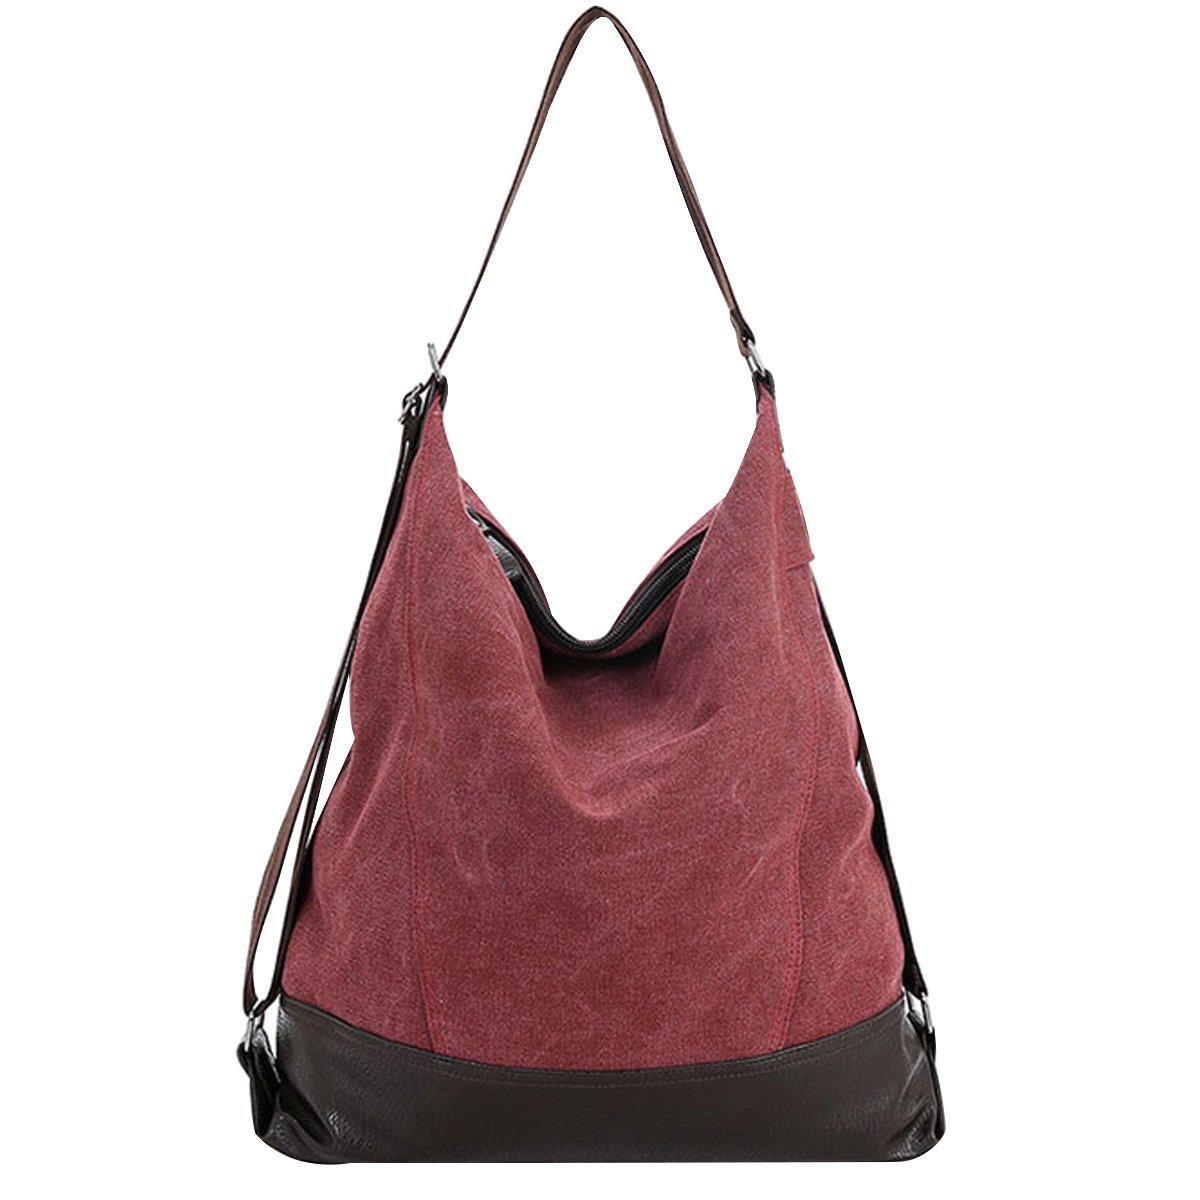 Goodbag Boutique Women Waterproof Nylon Tote Handbag Girl Versatile Satchel Purse Messenger Shoulder Bag Red by Goodbag Boutique